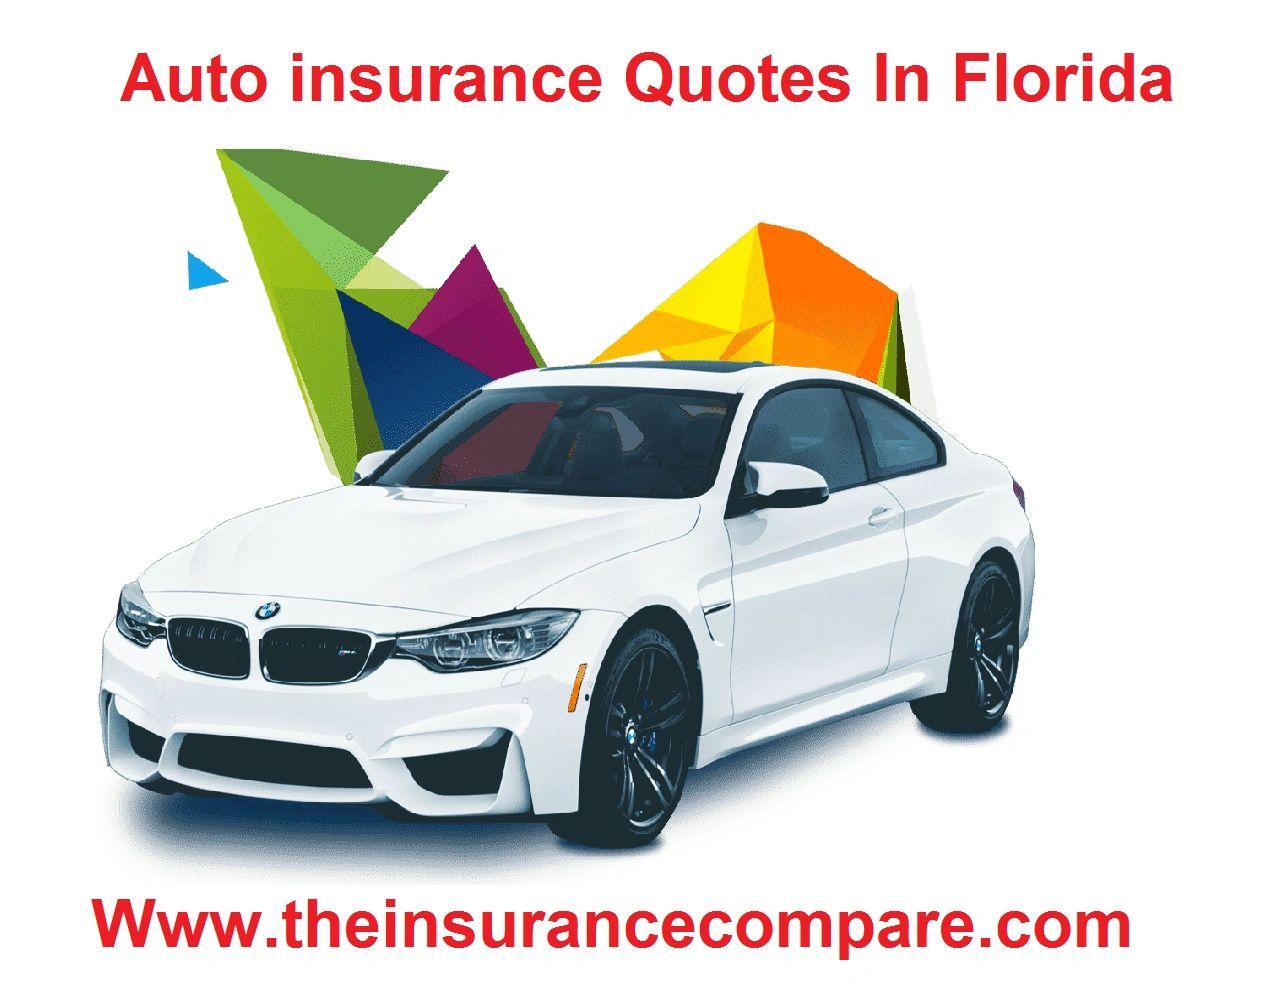 Secret Techniques For Auto Insurance Quotes In Florida